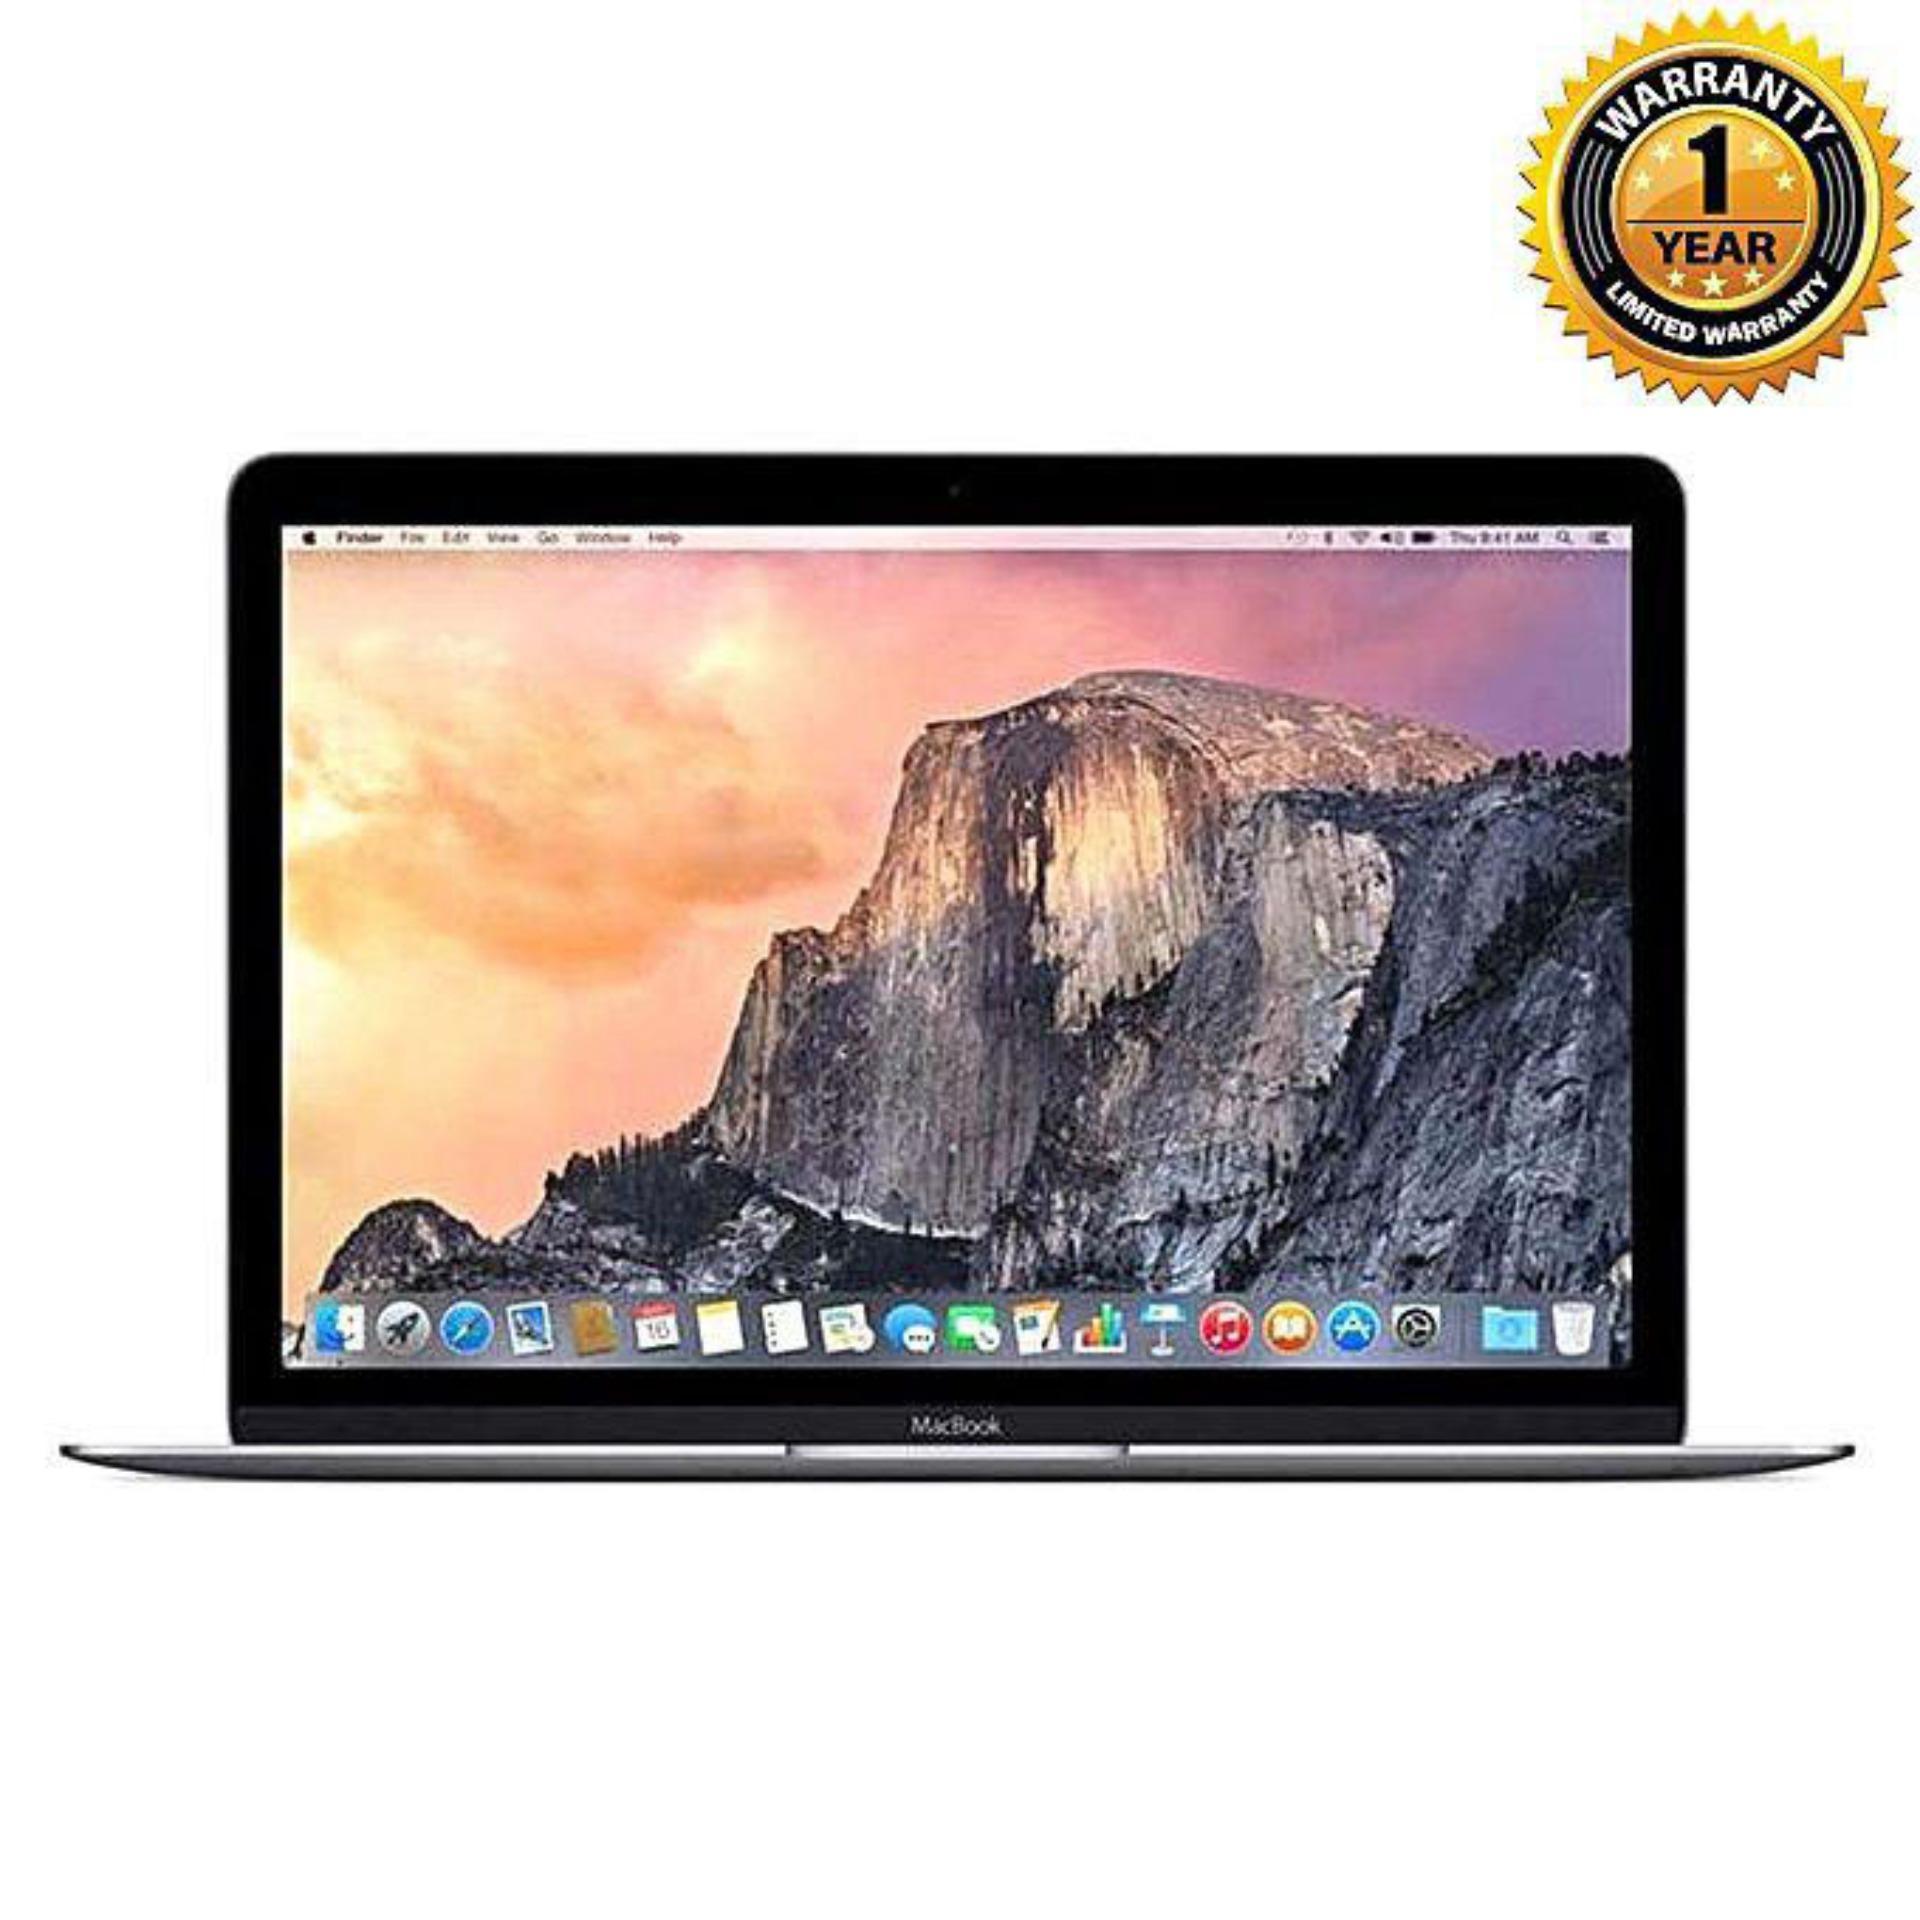 "MacBook Pro (MPTU2LL/A) - Intel Core i7 Dual-Core - 16GB RAM - 256GB SSD - Iris Plus Graphics 630 - 15.4""- Laptop - Space Grey"